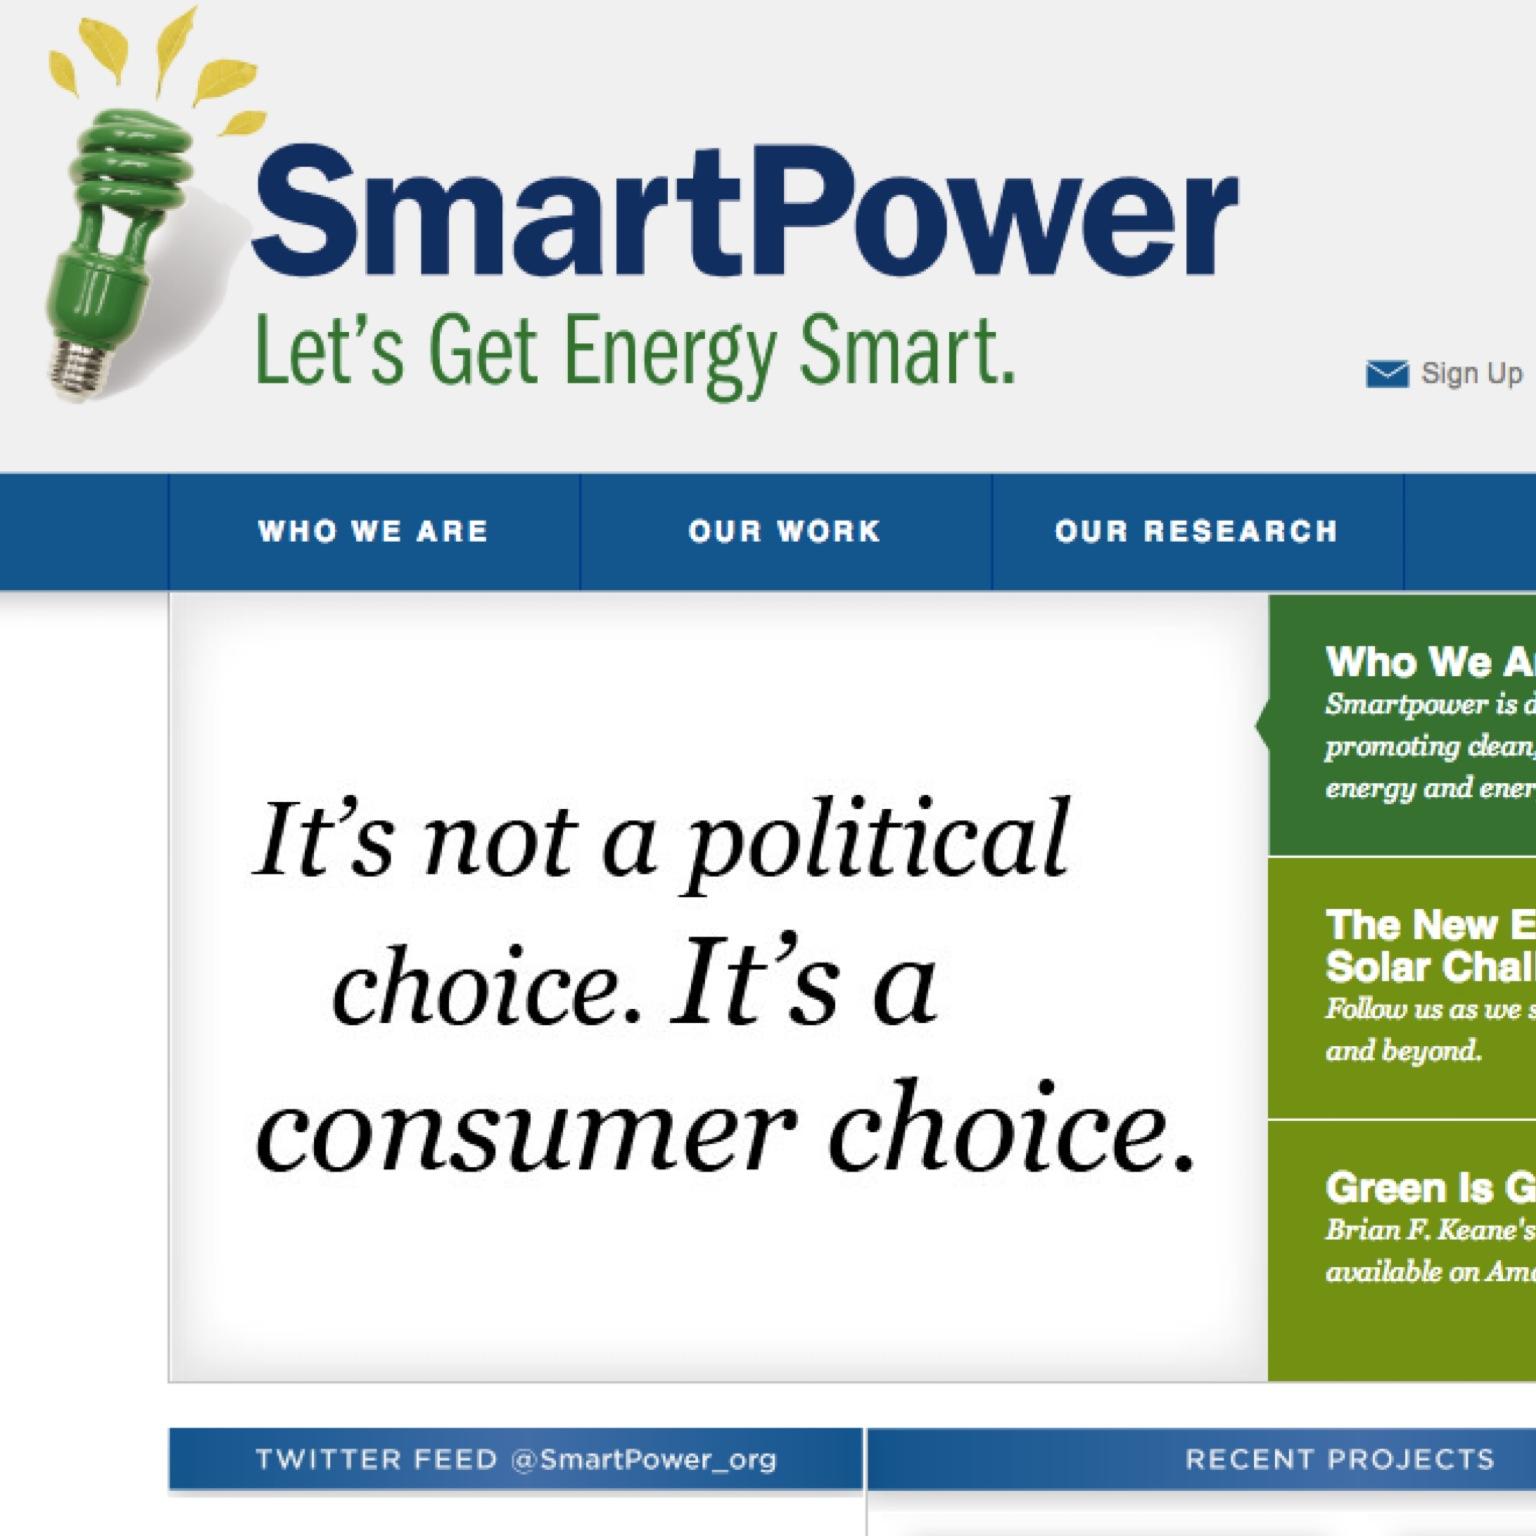 smartpower.jpg